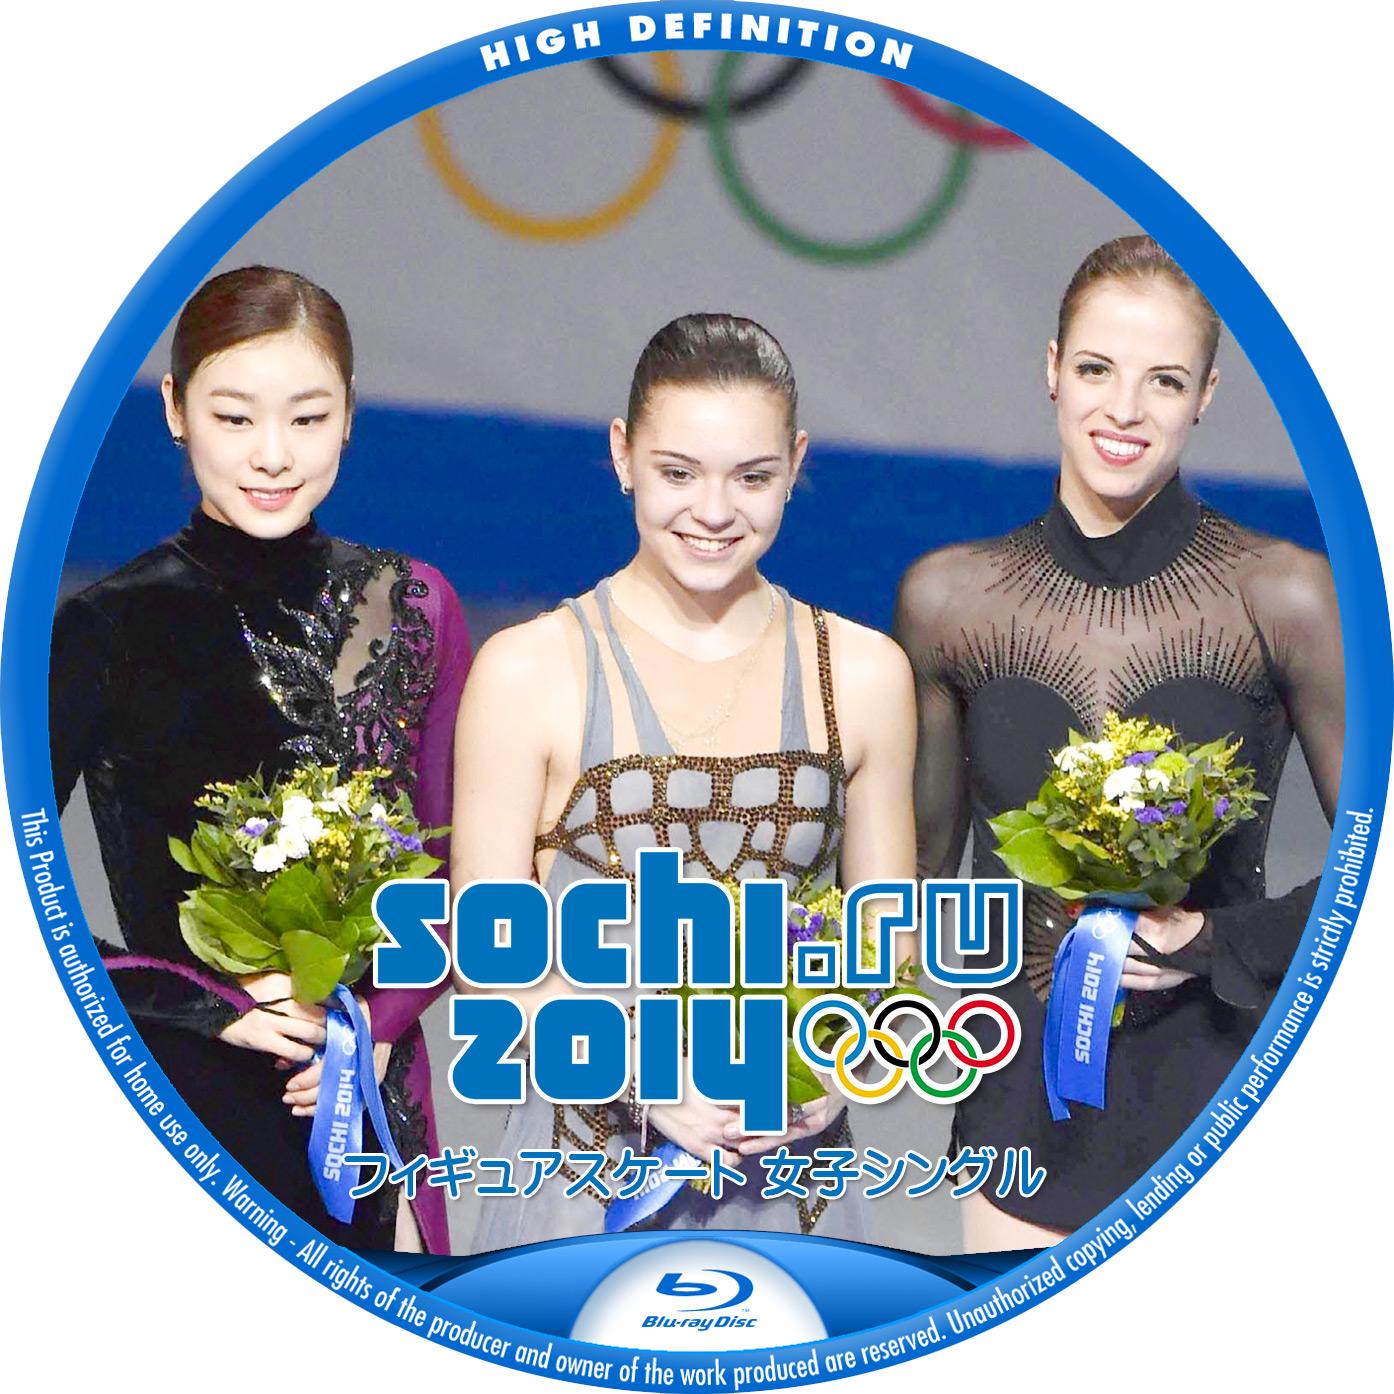 Sochi_Figure_Woens-BD6